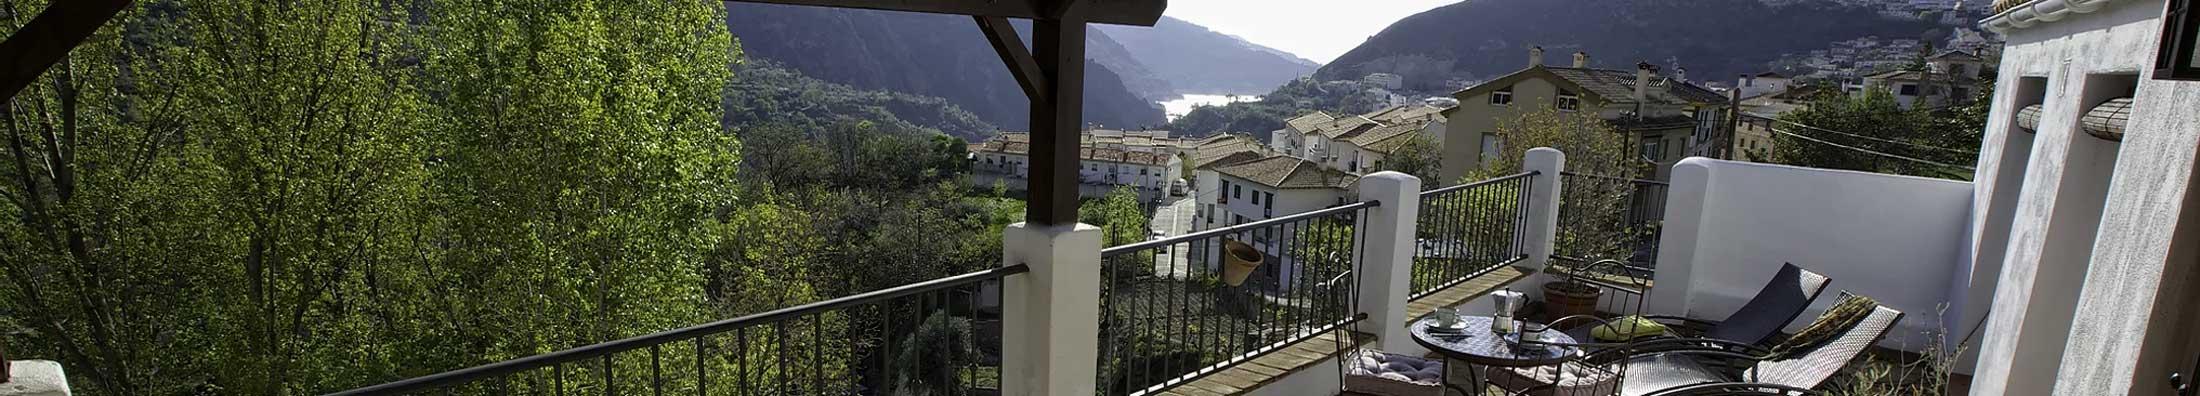 Beste Bed and Breakfast - B&B Arroyo de la Greda - Andalusië - Guejar Sierra - topfoto